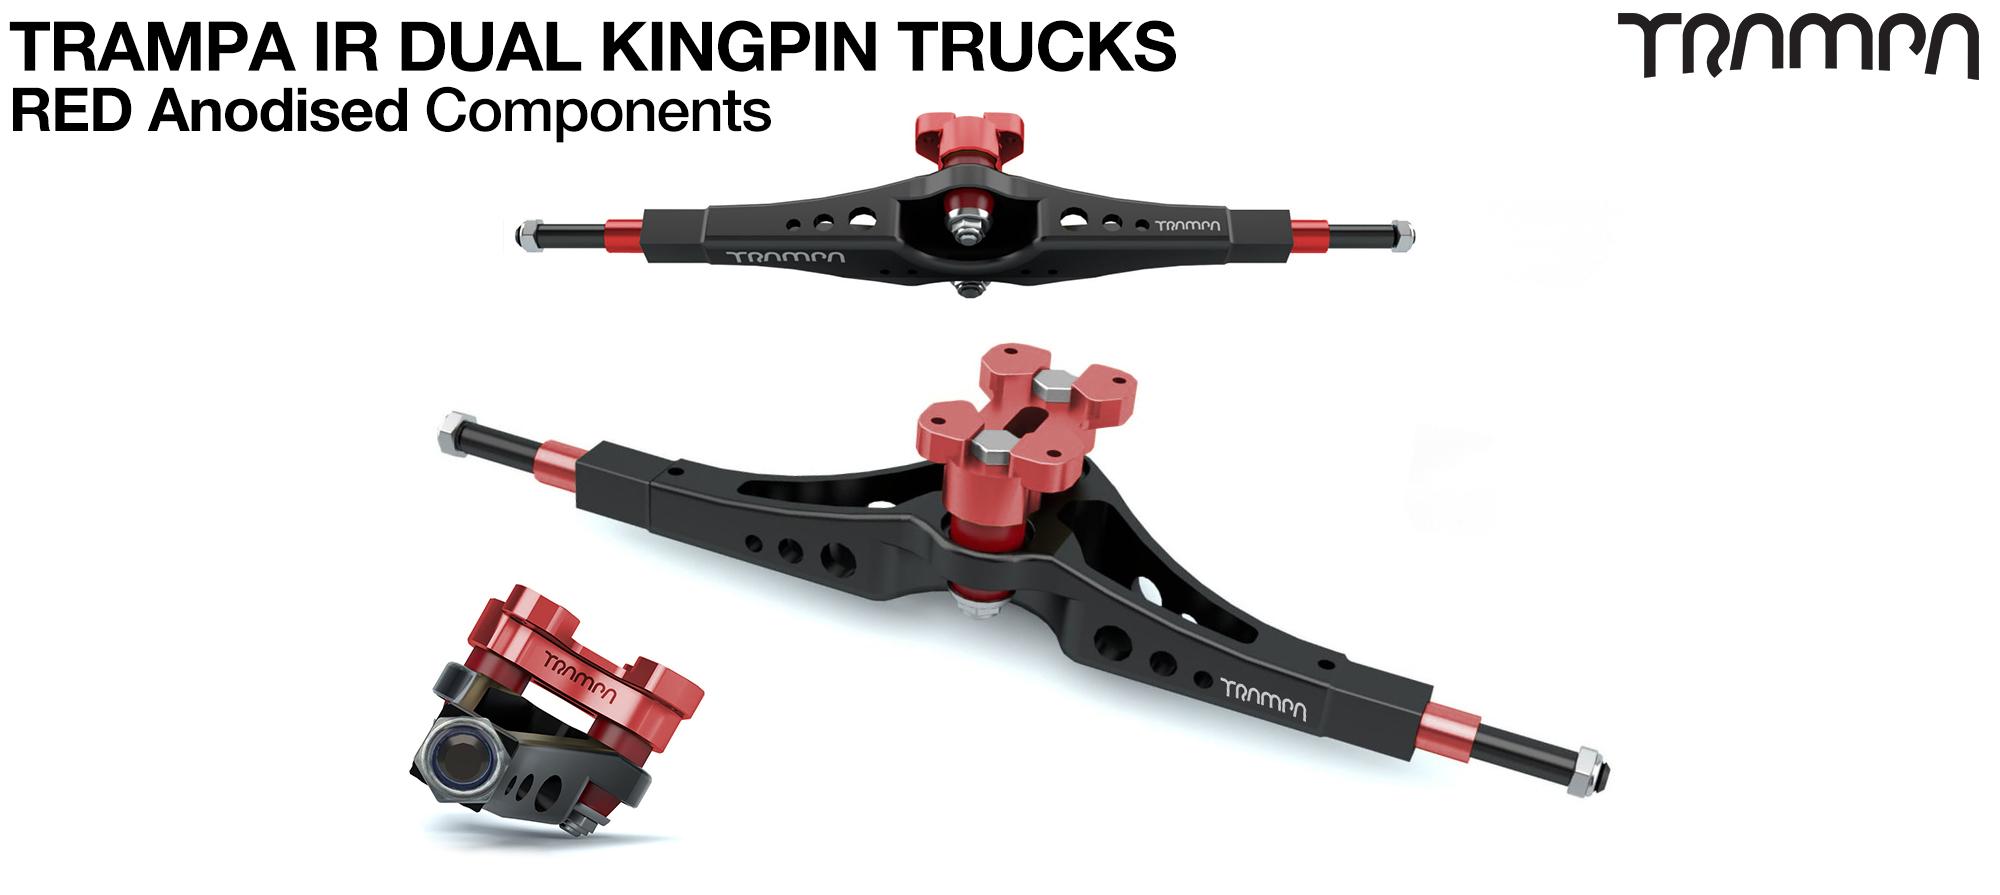 TRAMPA IR Double Kingpinned Skate Style Trucks fit every 19.1mm Motor Mount TRAMPA offers - RED